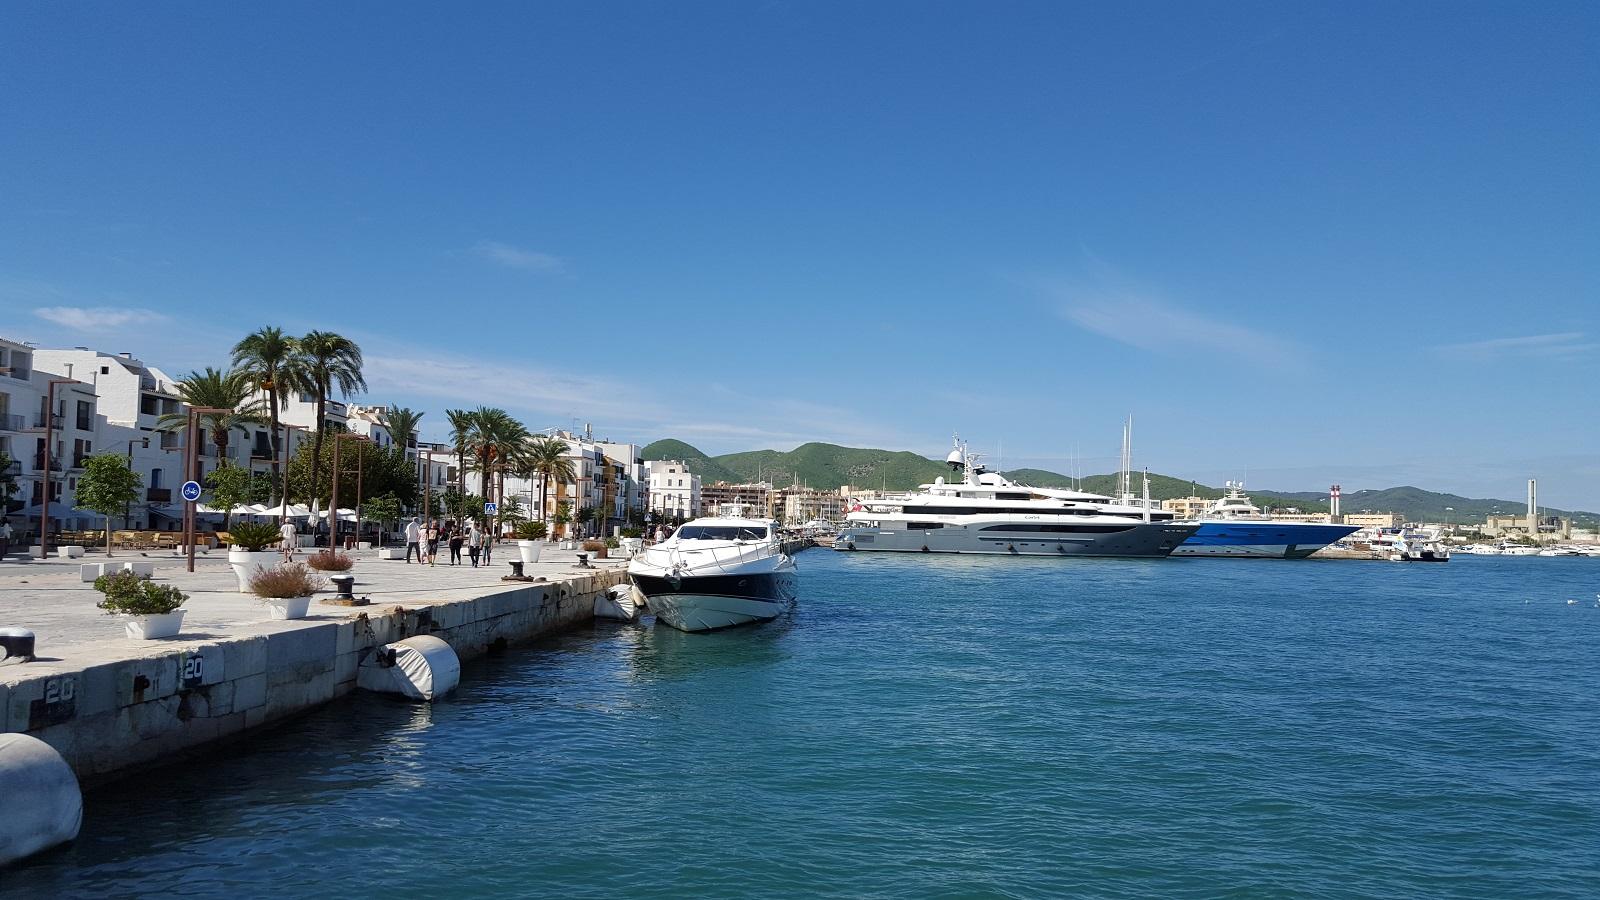 ibiza quai des yachts small